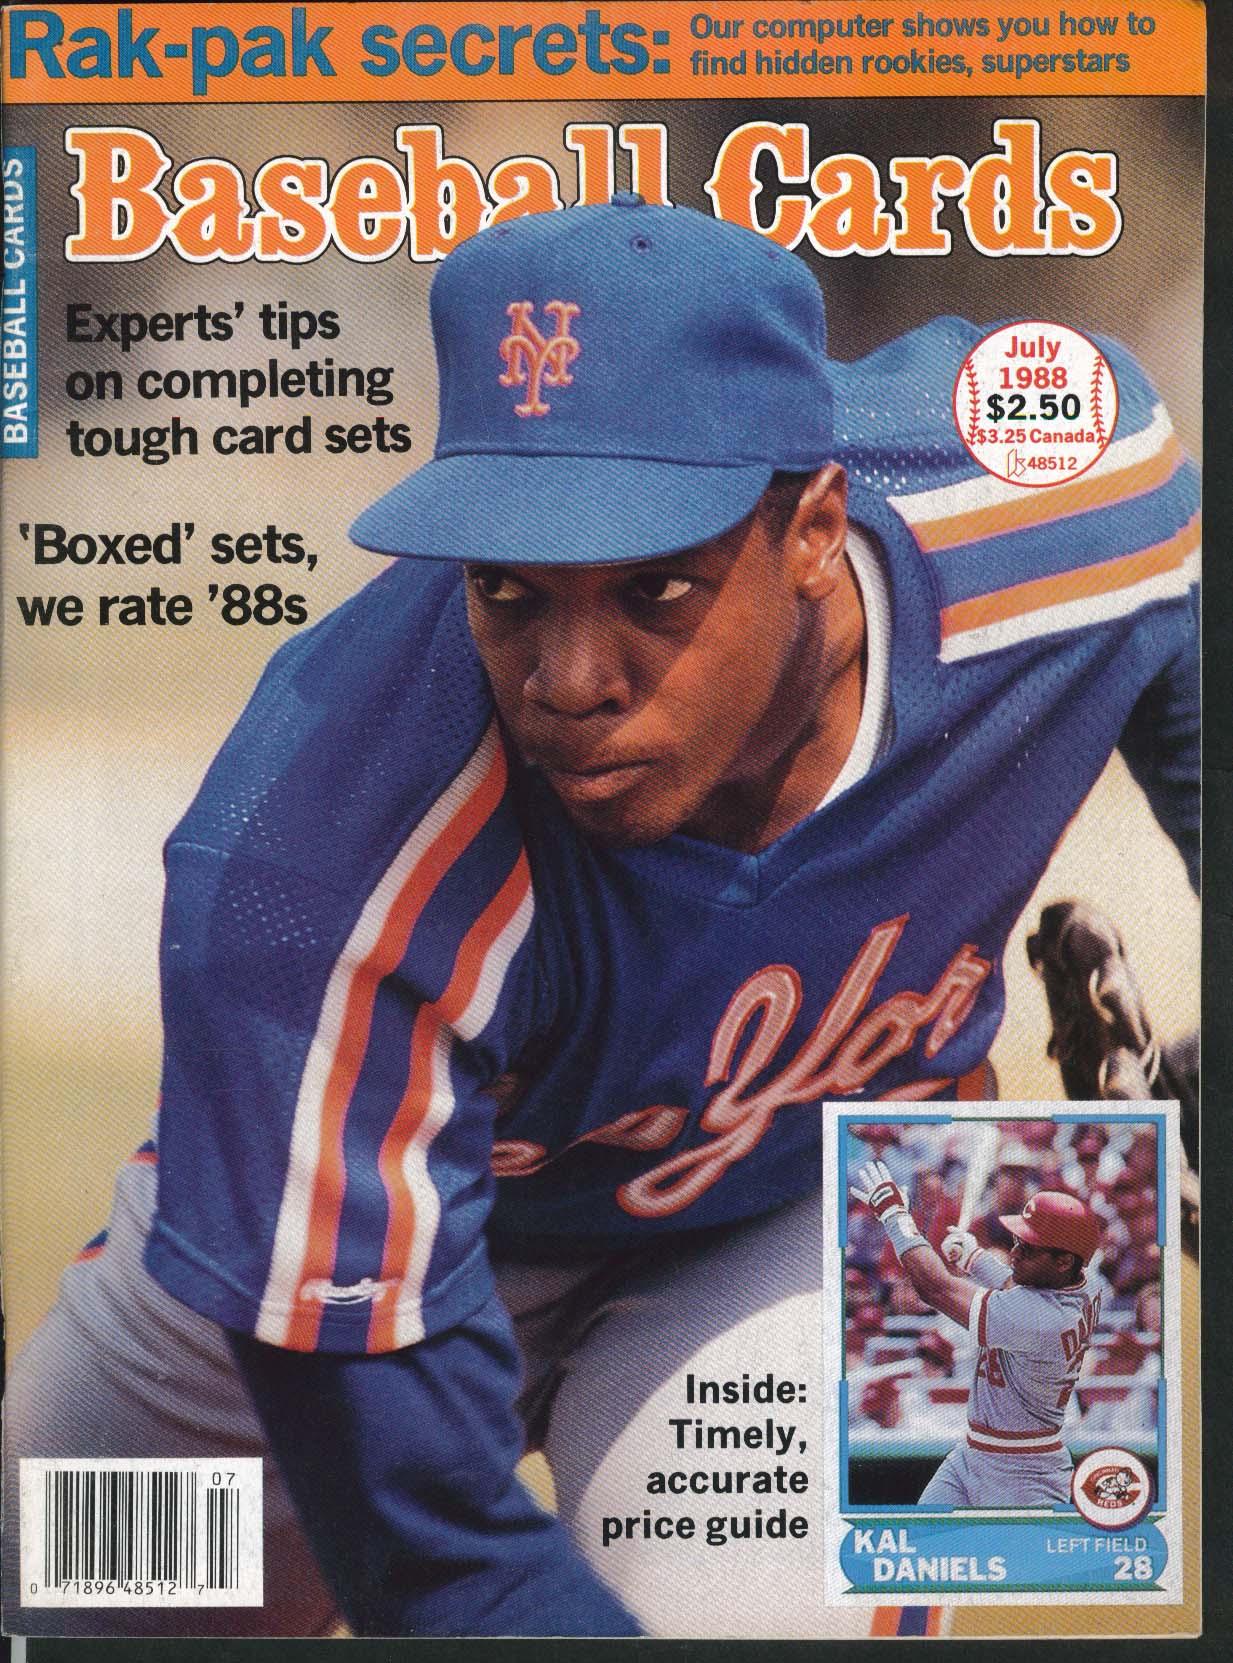 BASEBALL CARDS Kal Daniels Jeff Zeigler Dave Moriah Larry Sheets 7 1988